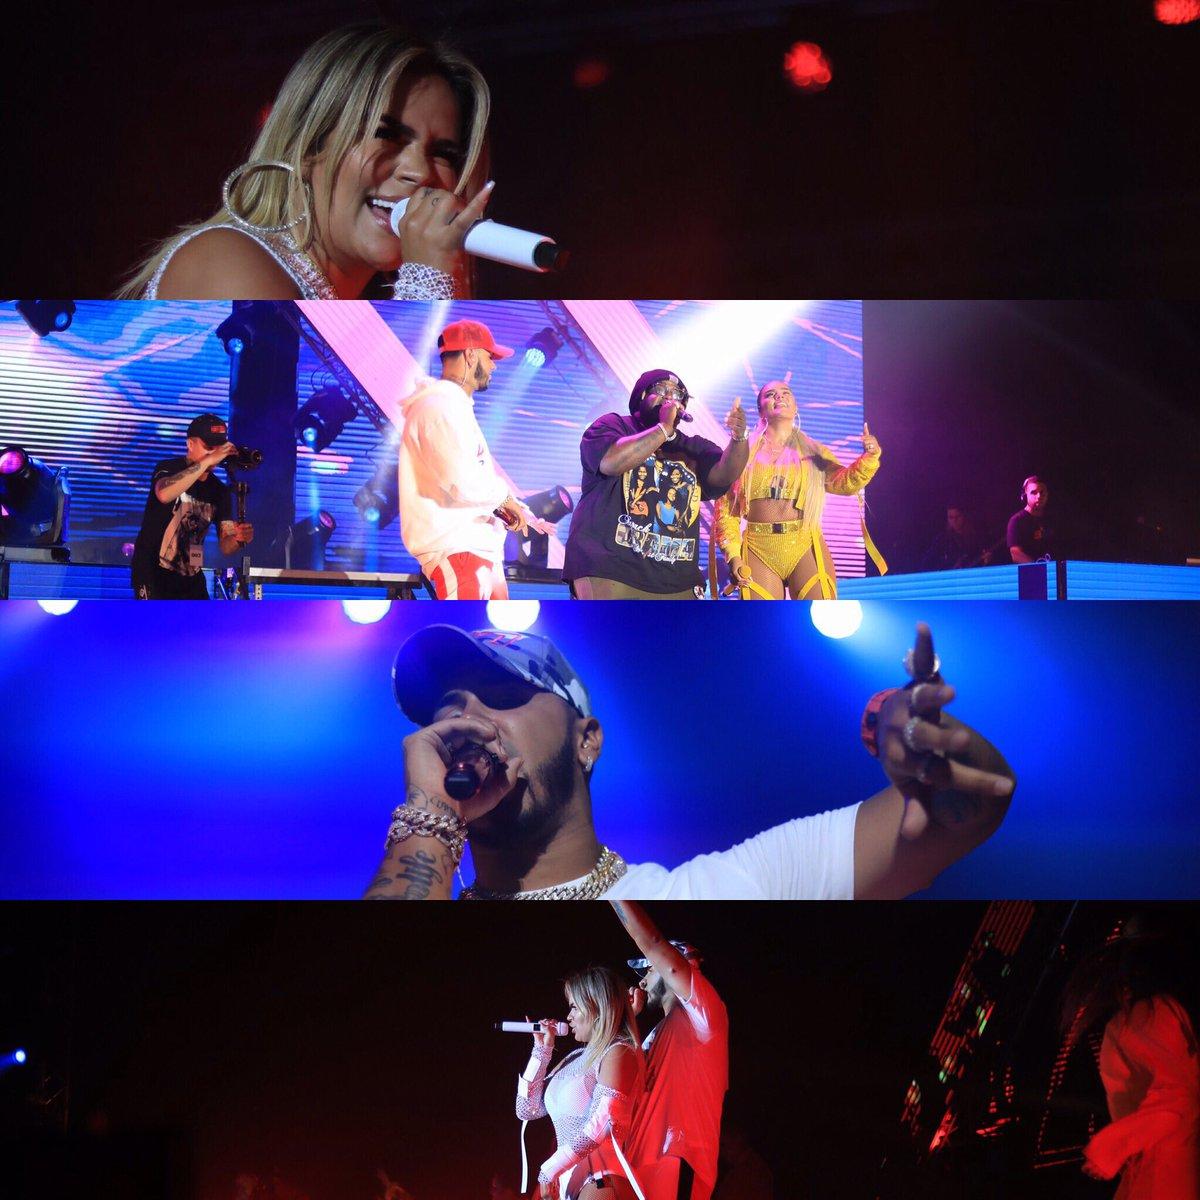 Culpables tour 2k19 PANAMA CITY  @KarolGmusic @Anuel_2bleA @MusicSech<br>http://pic.twitter.com/ttiQXtlo3B